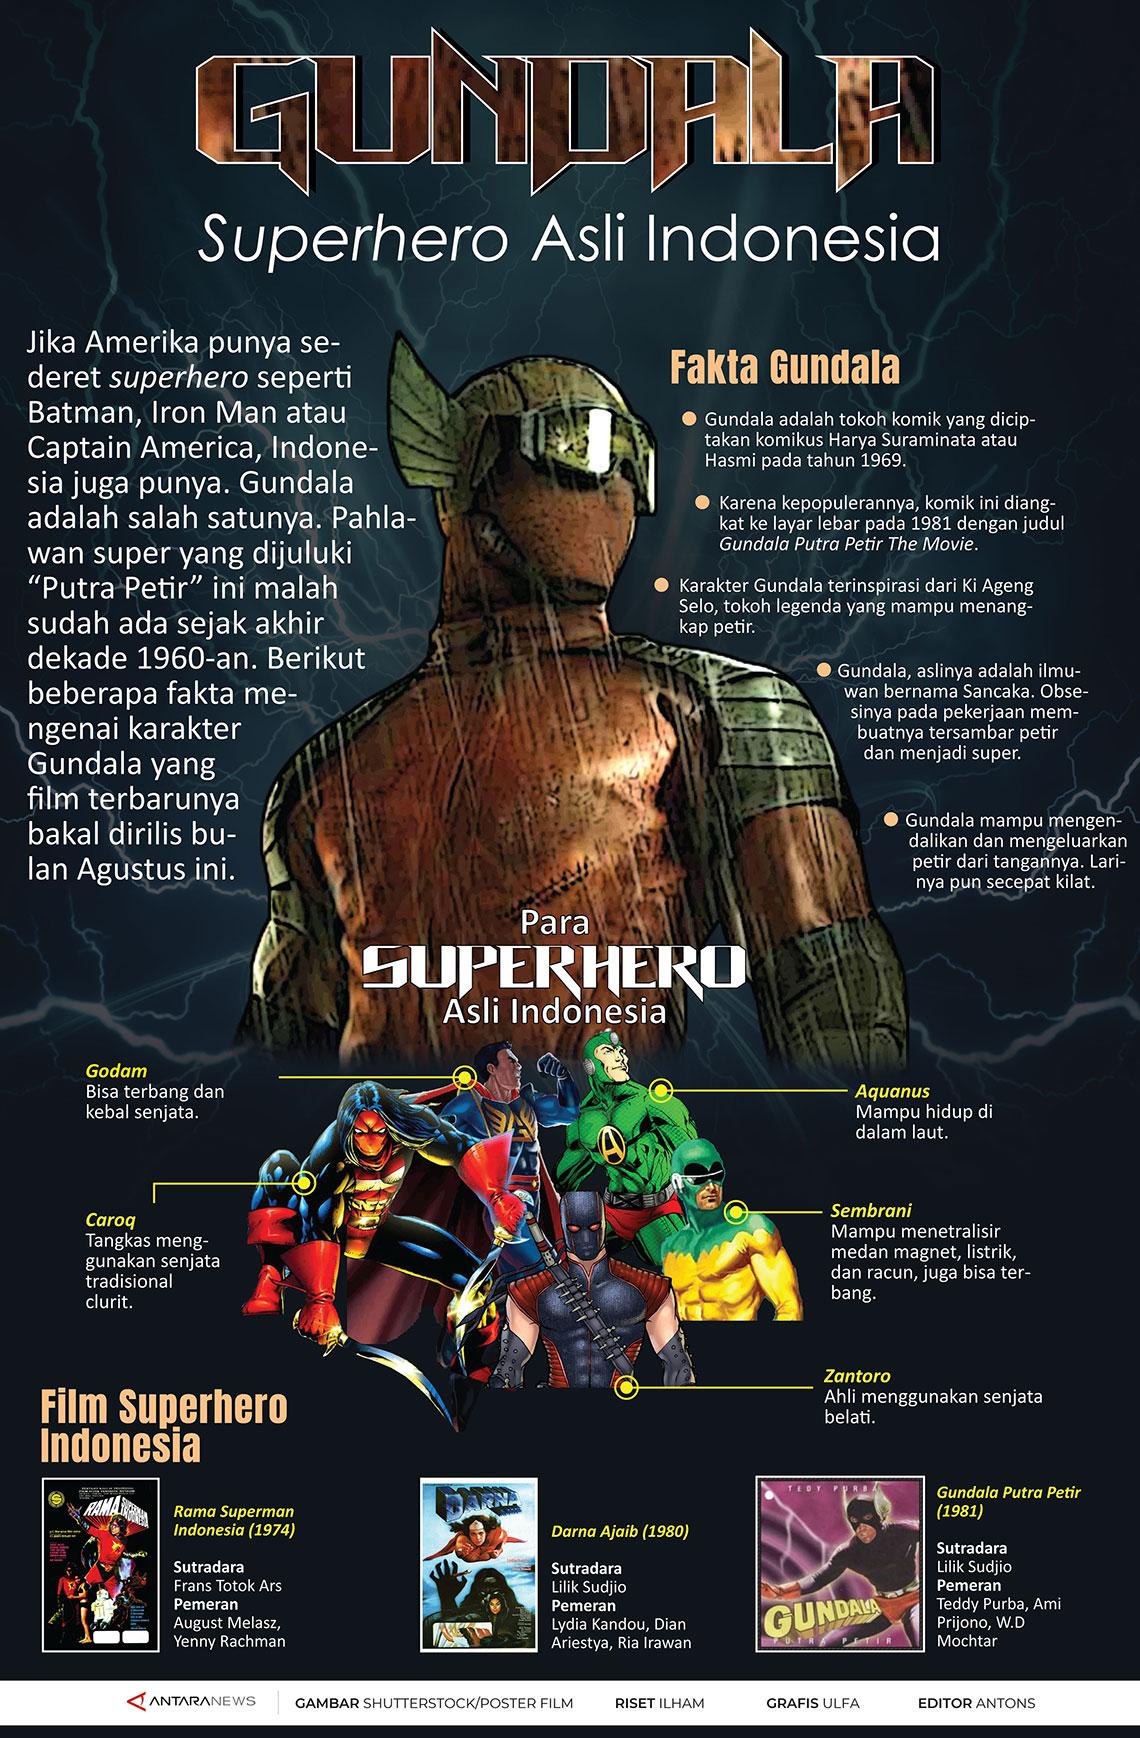 Gundala superhero asli Indonesia